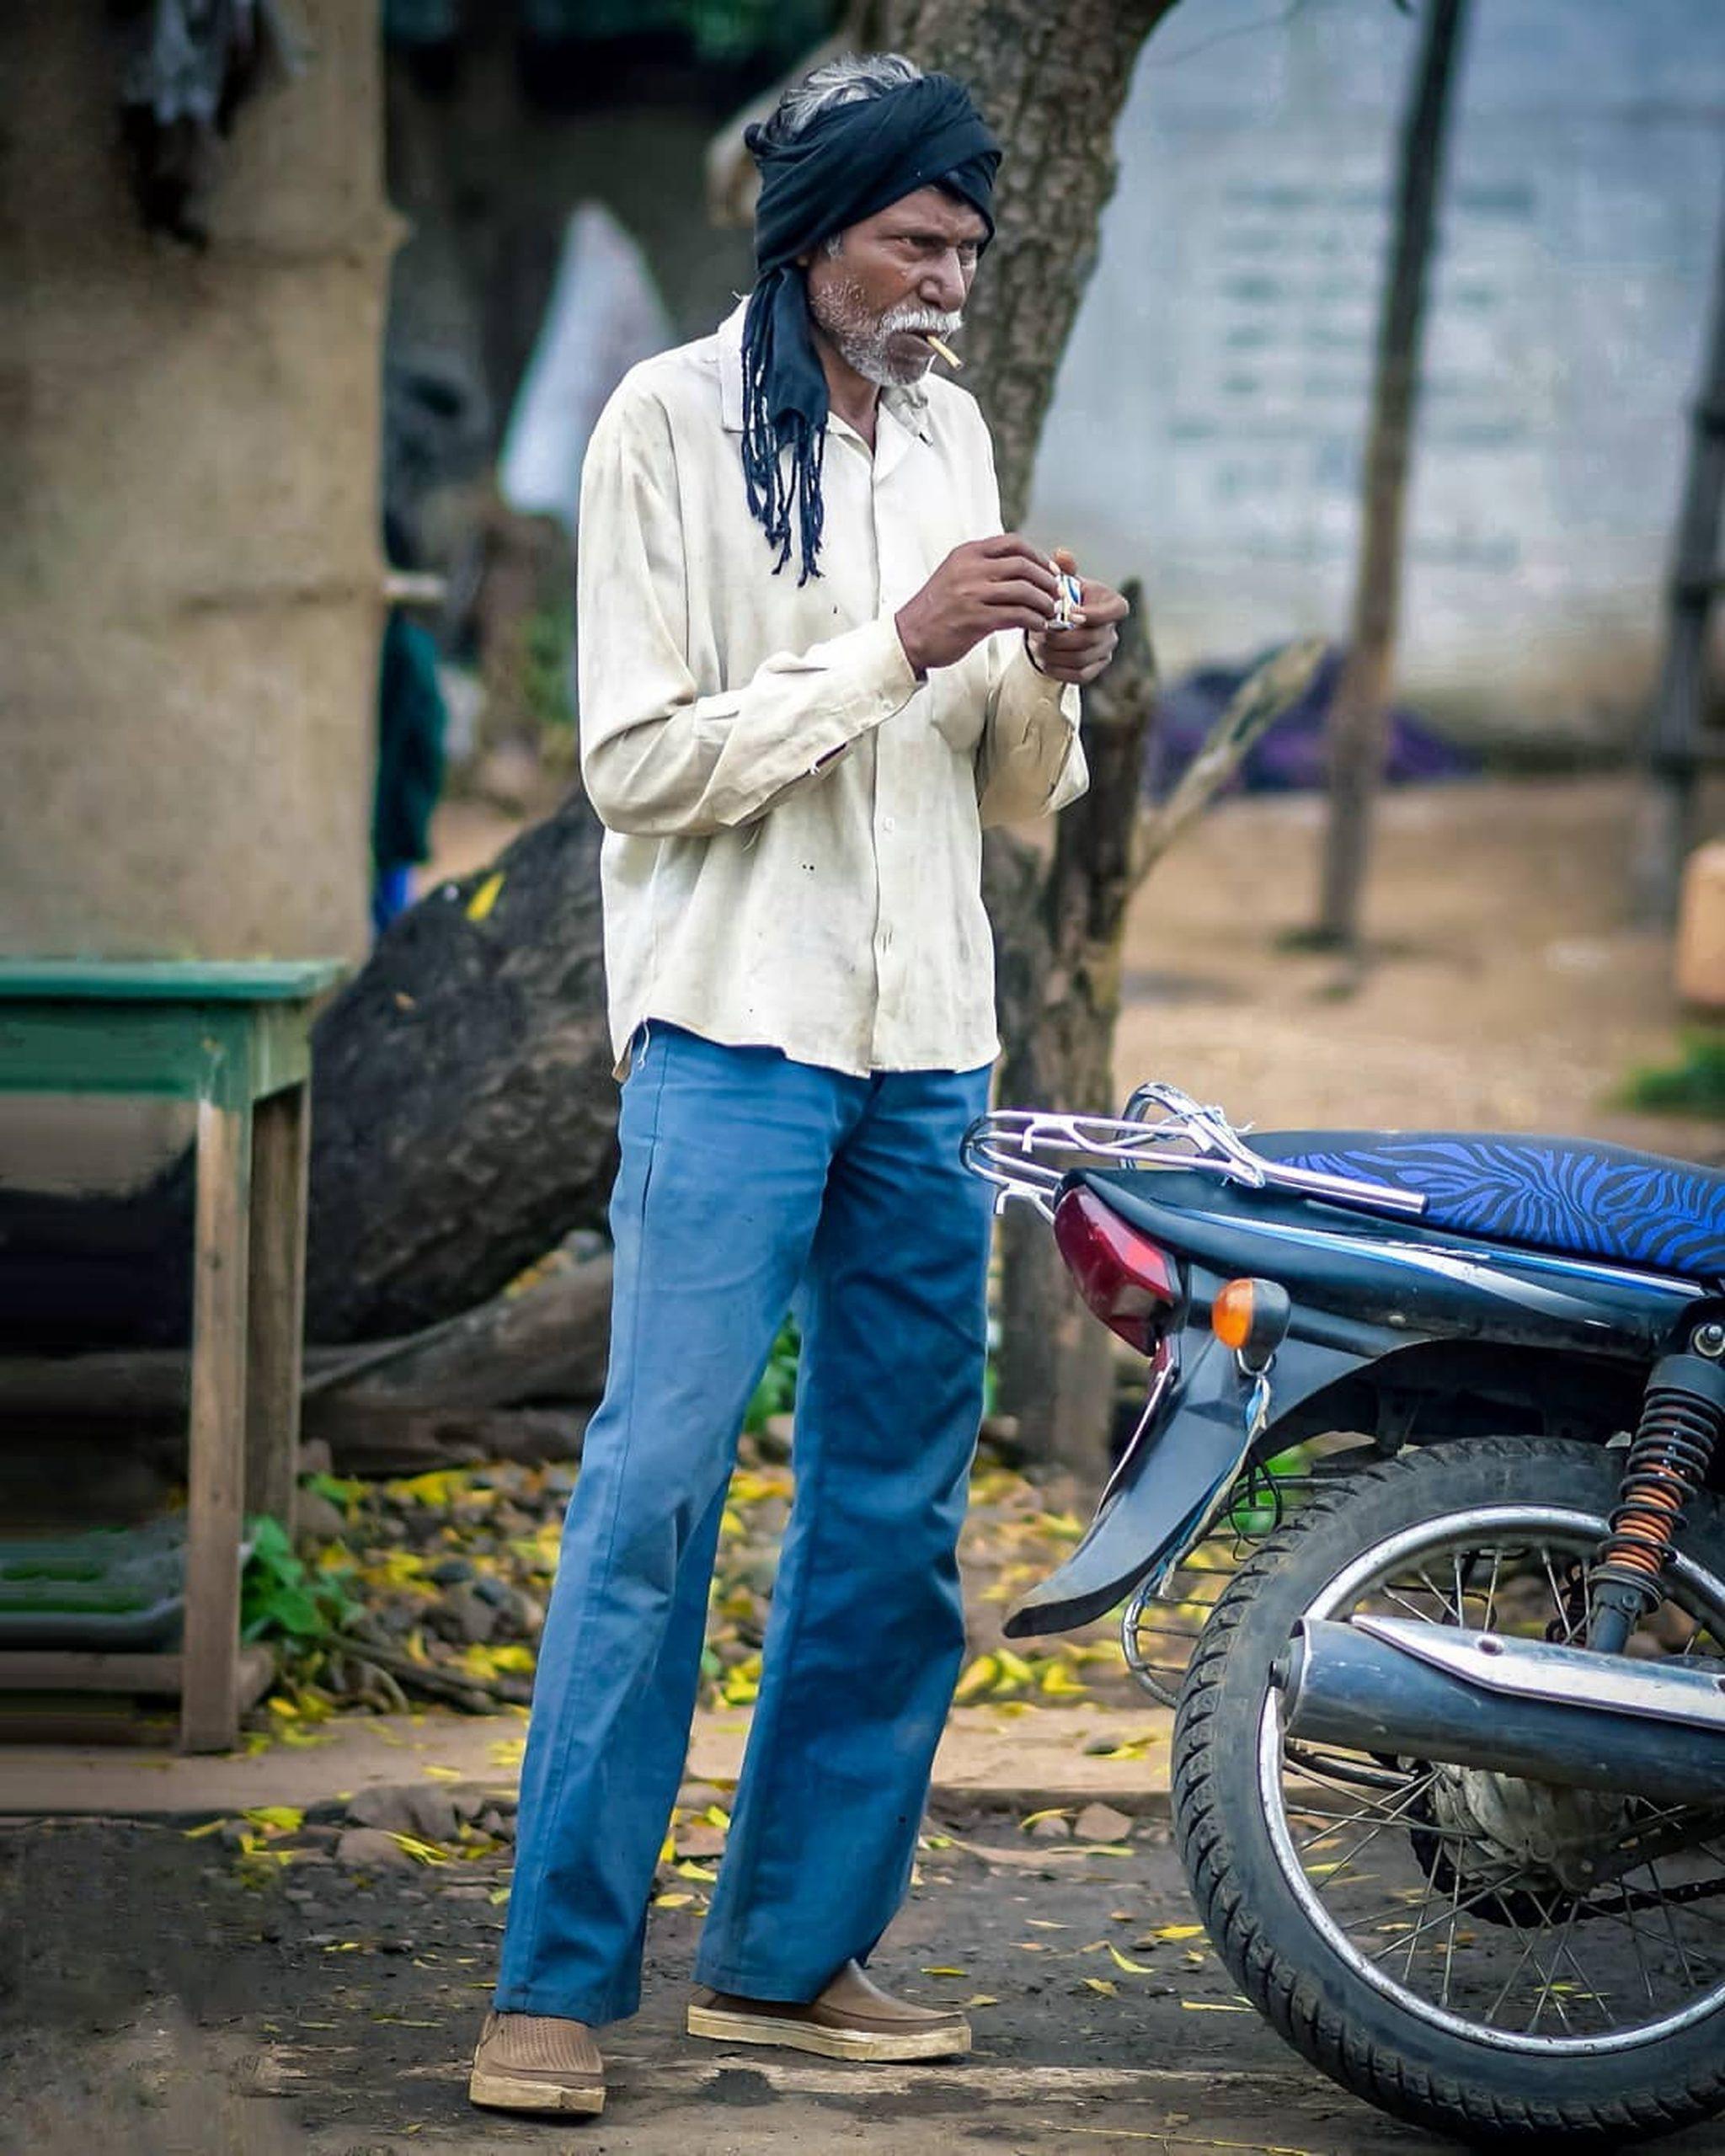 An old Man smoking cigarettes